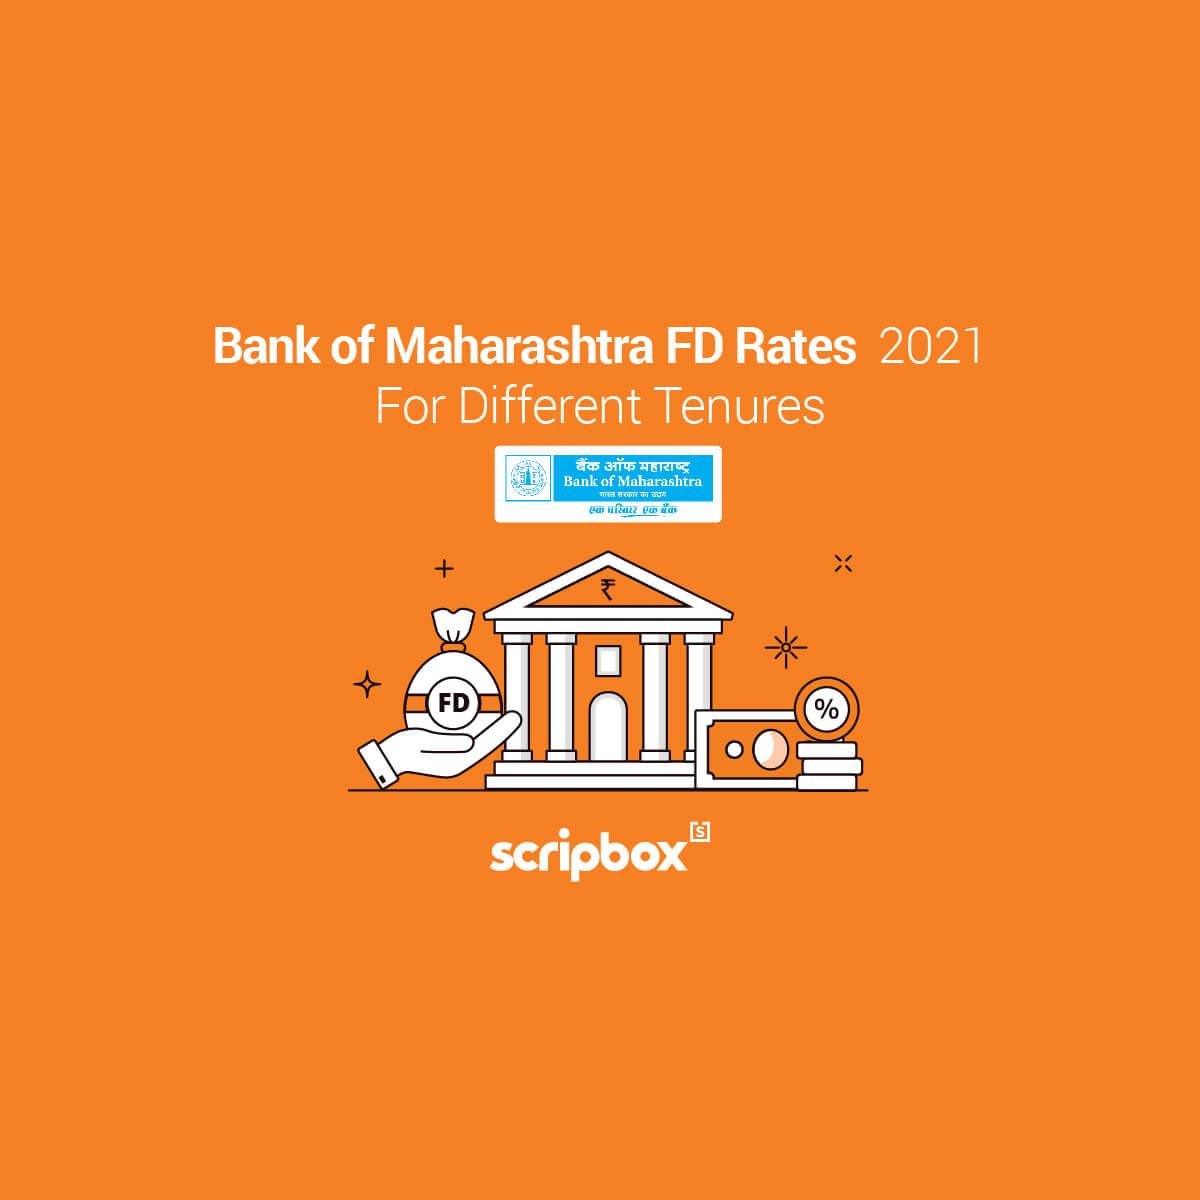 bank of maharashtra fd rates